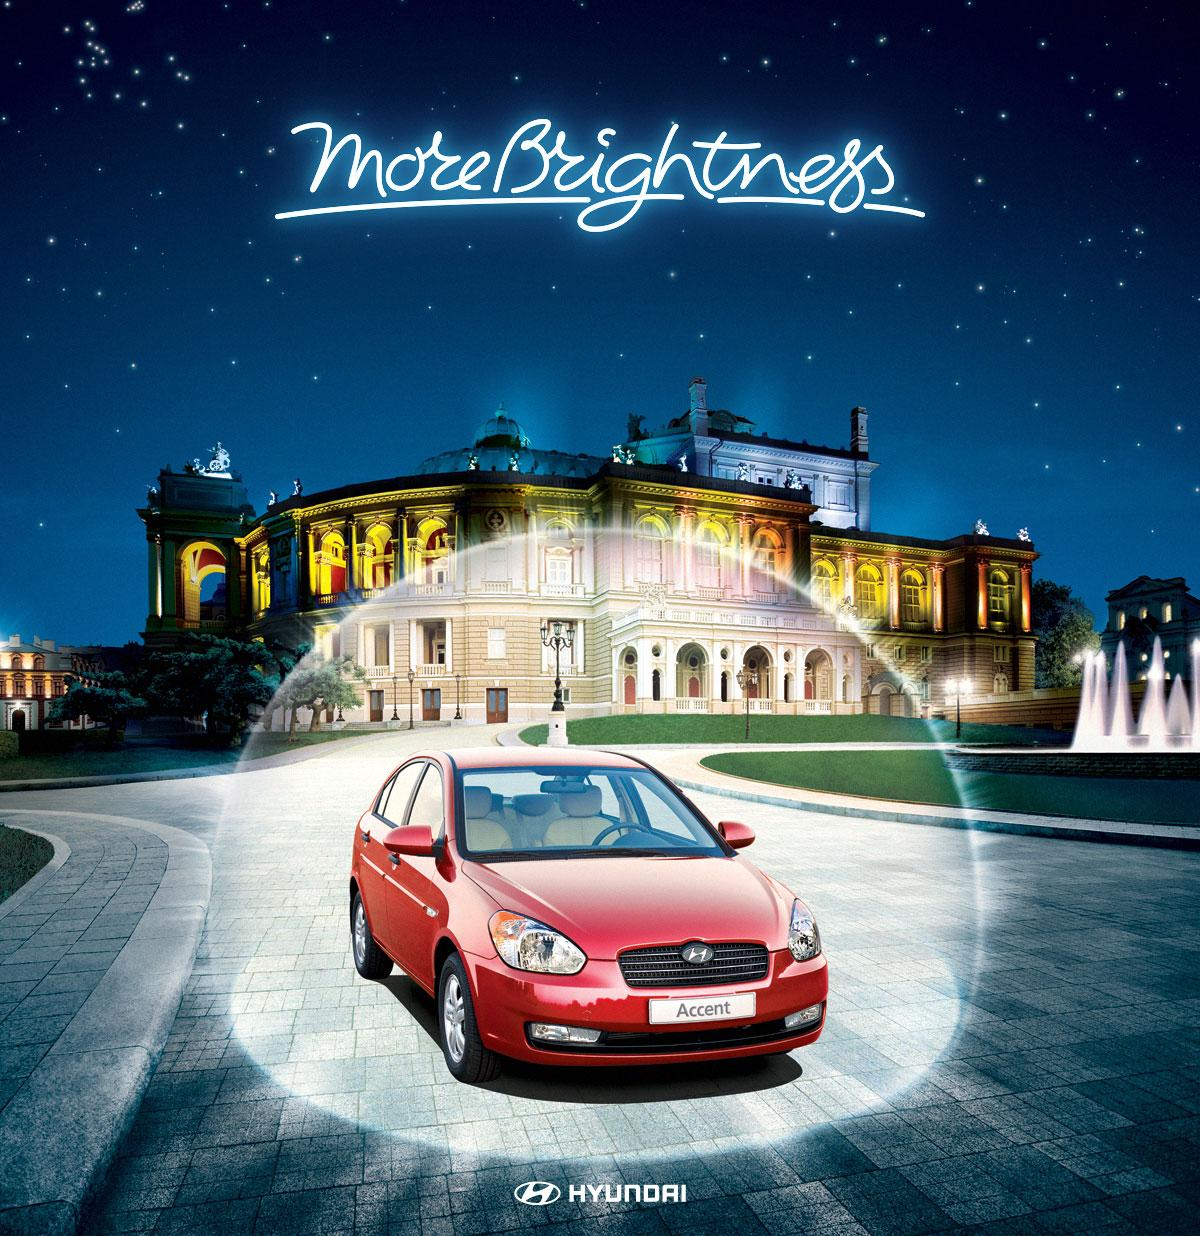 Hyundai Print Ad -  More brightness, 2